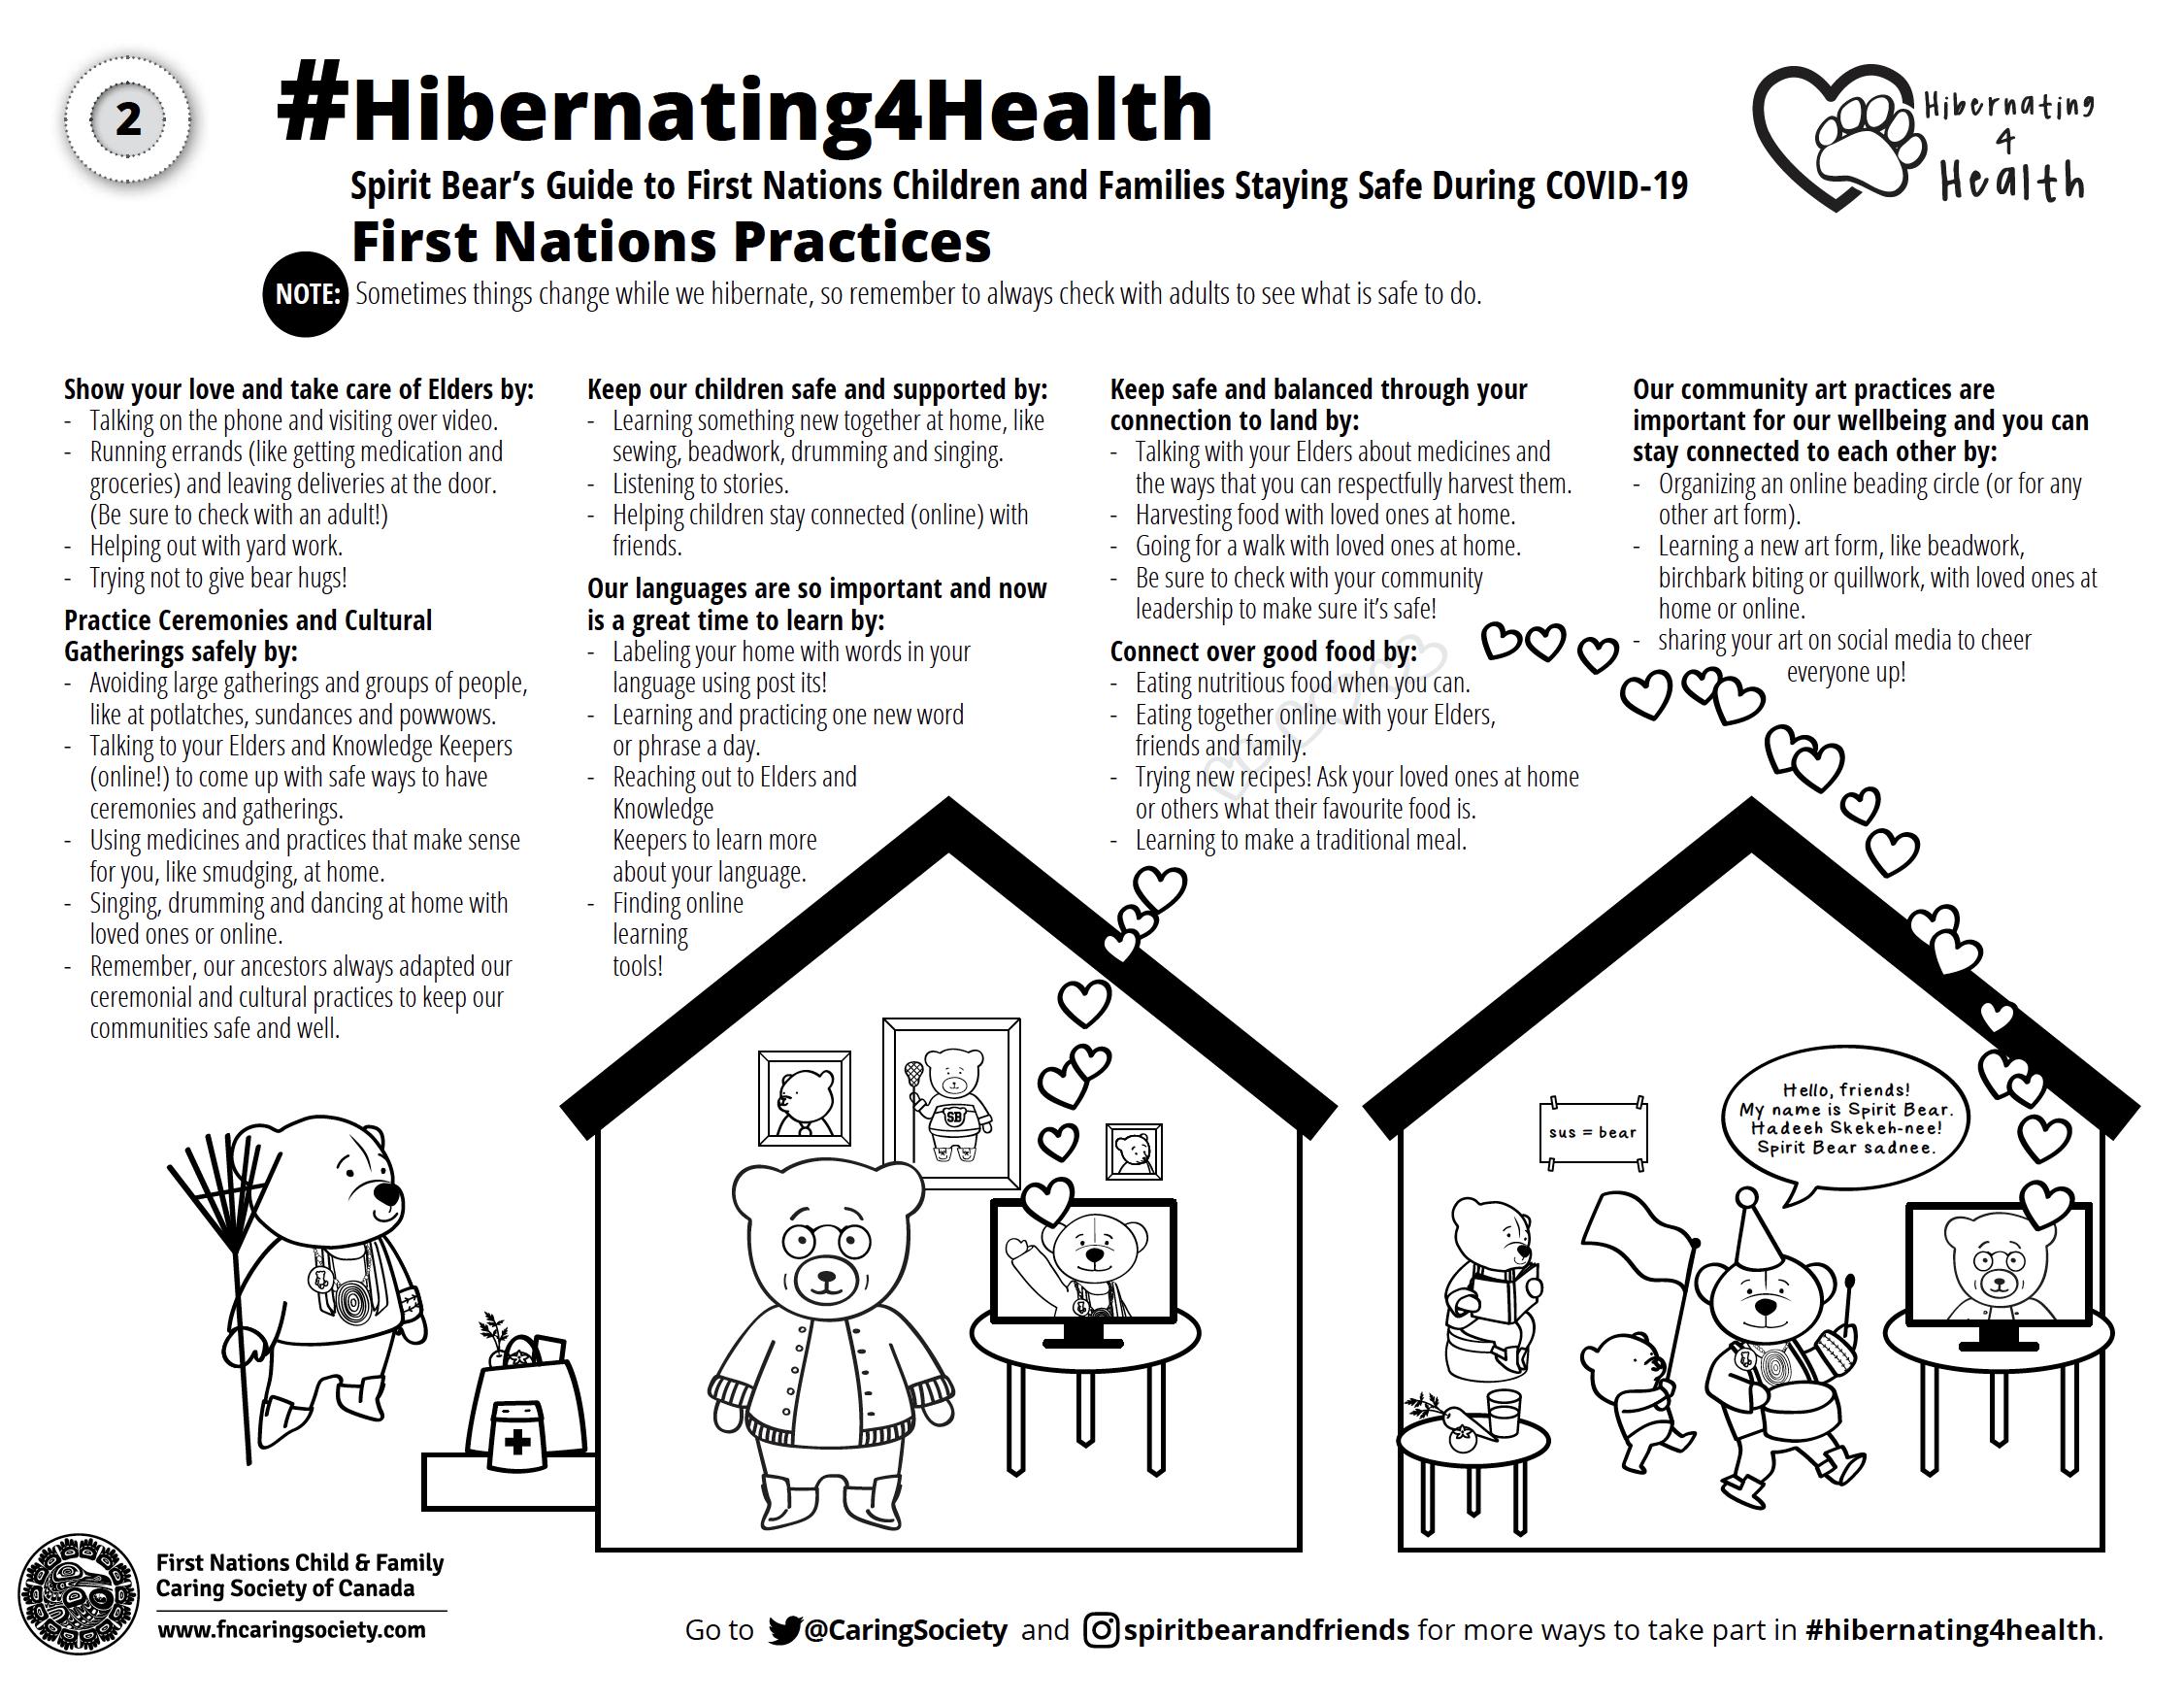 #Hibernating4Health Colouring Sheet #2